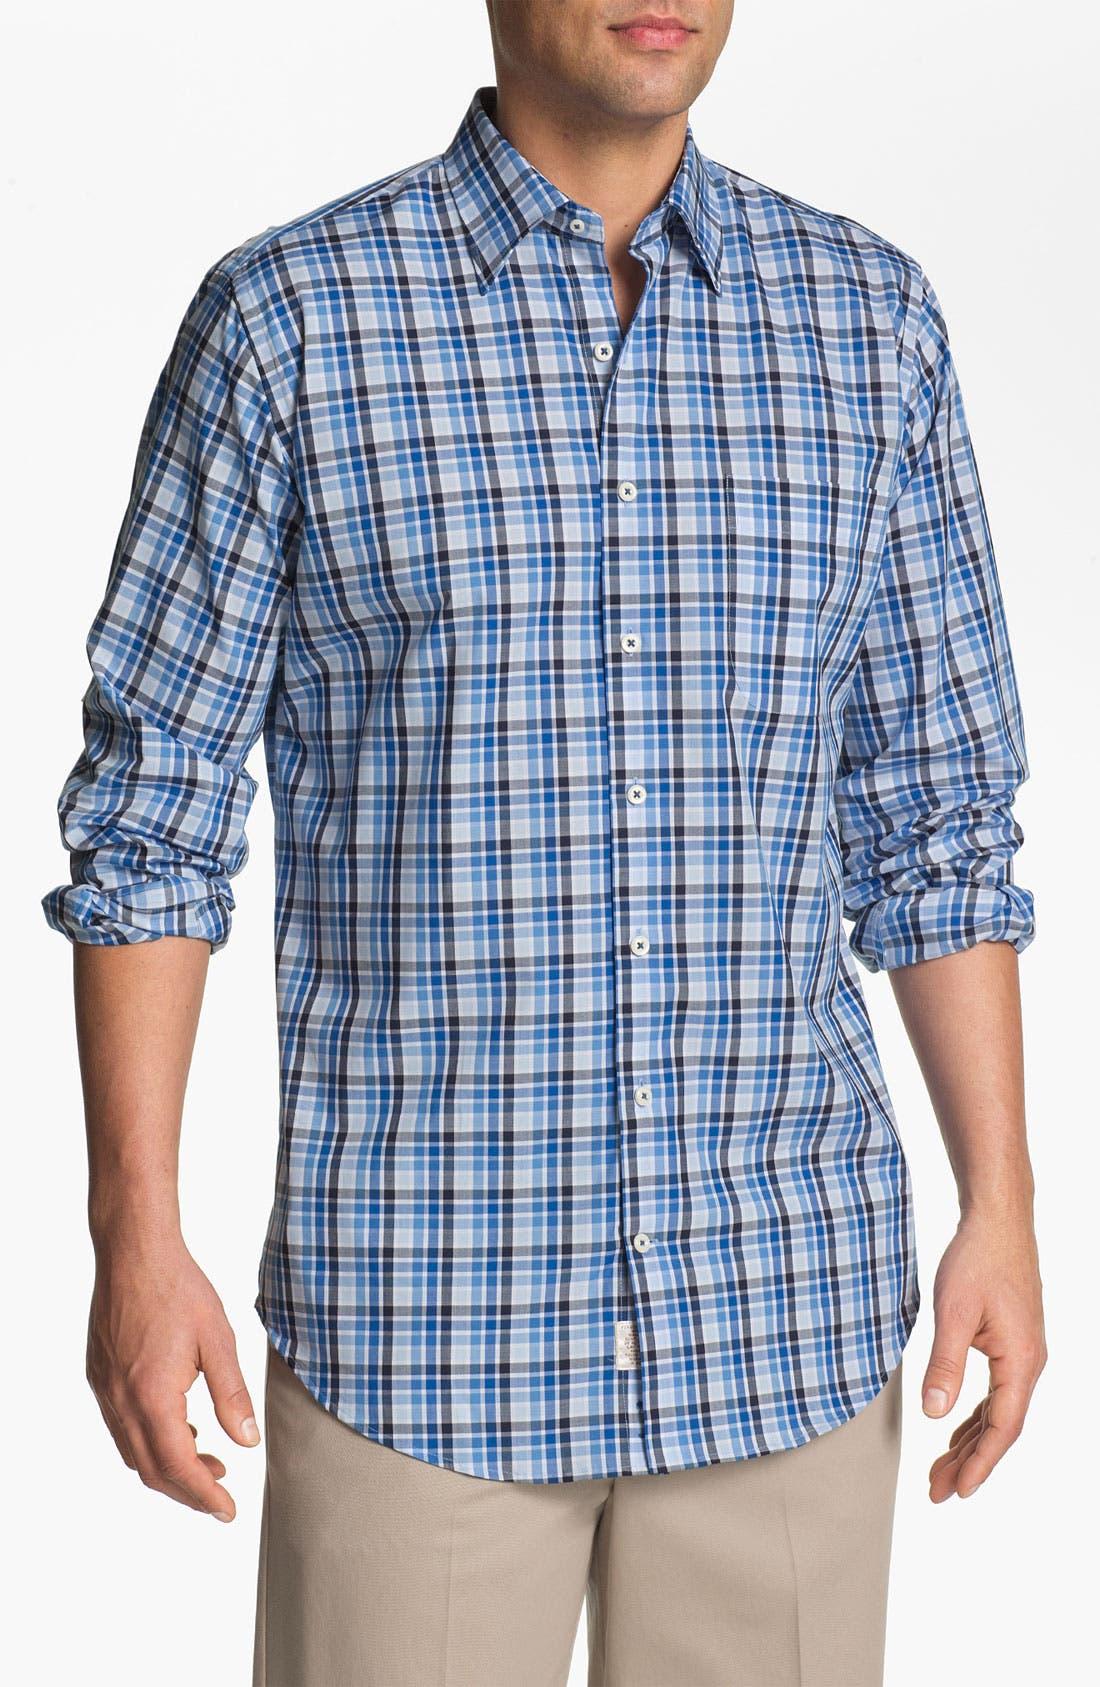 Alternate Image 1 Selected - Peter Millar 'Zurich' Regular Fit Plaid Sport Shirt